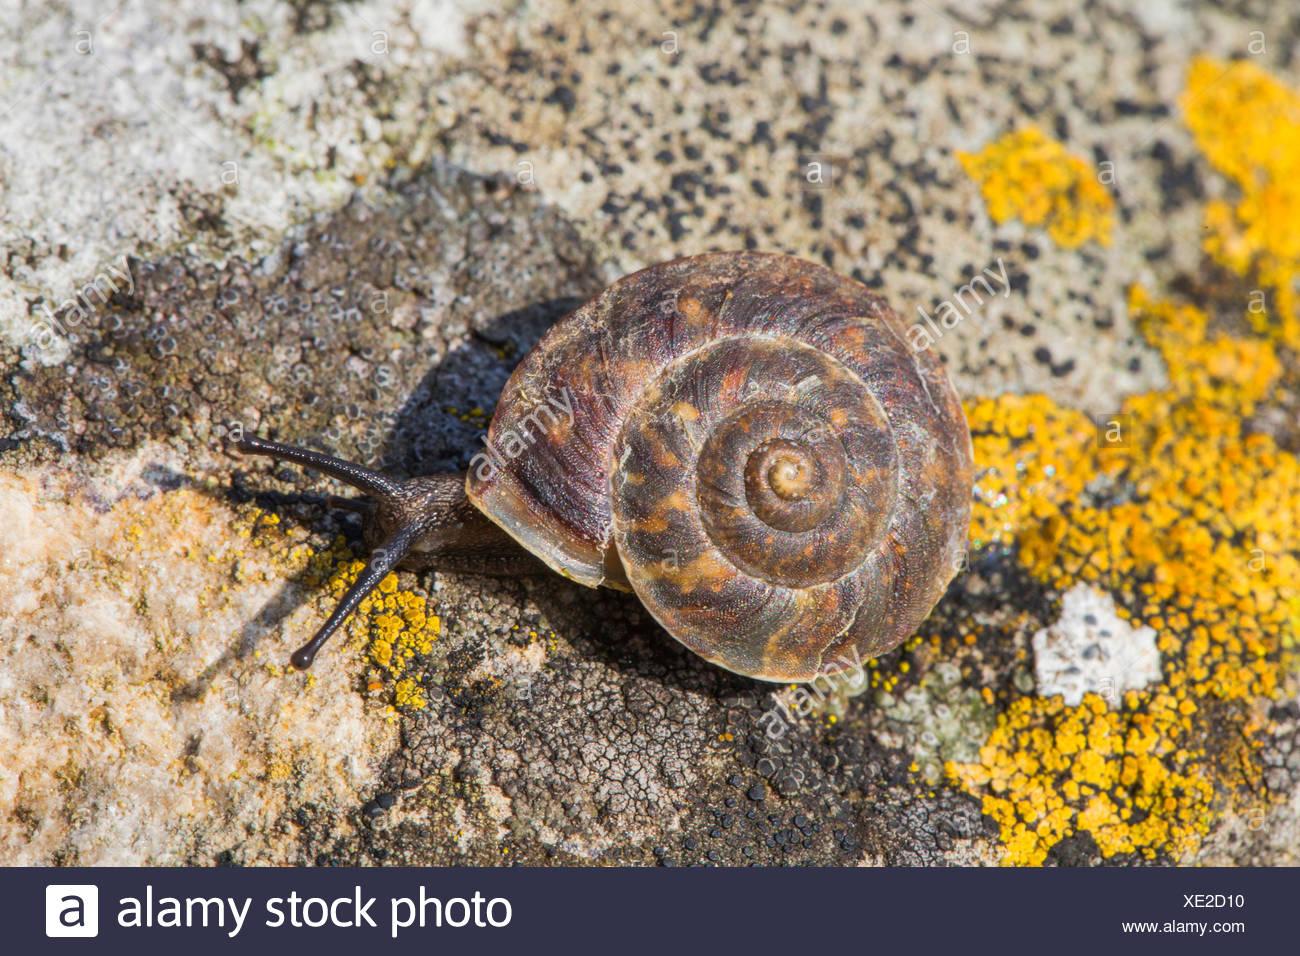 Lapidary snail (Helicigona lapicida, Chilotrema lapicida, Latomus lapicida), creeps on a rock, Germany, Bavaria, Niederbayern, Lower Bavaria Stock Photo